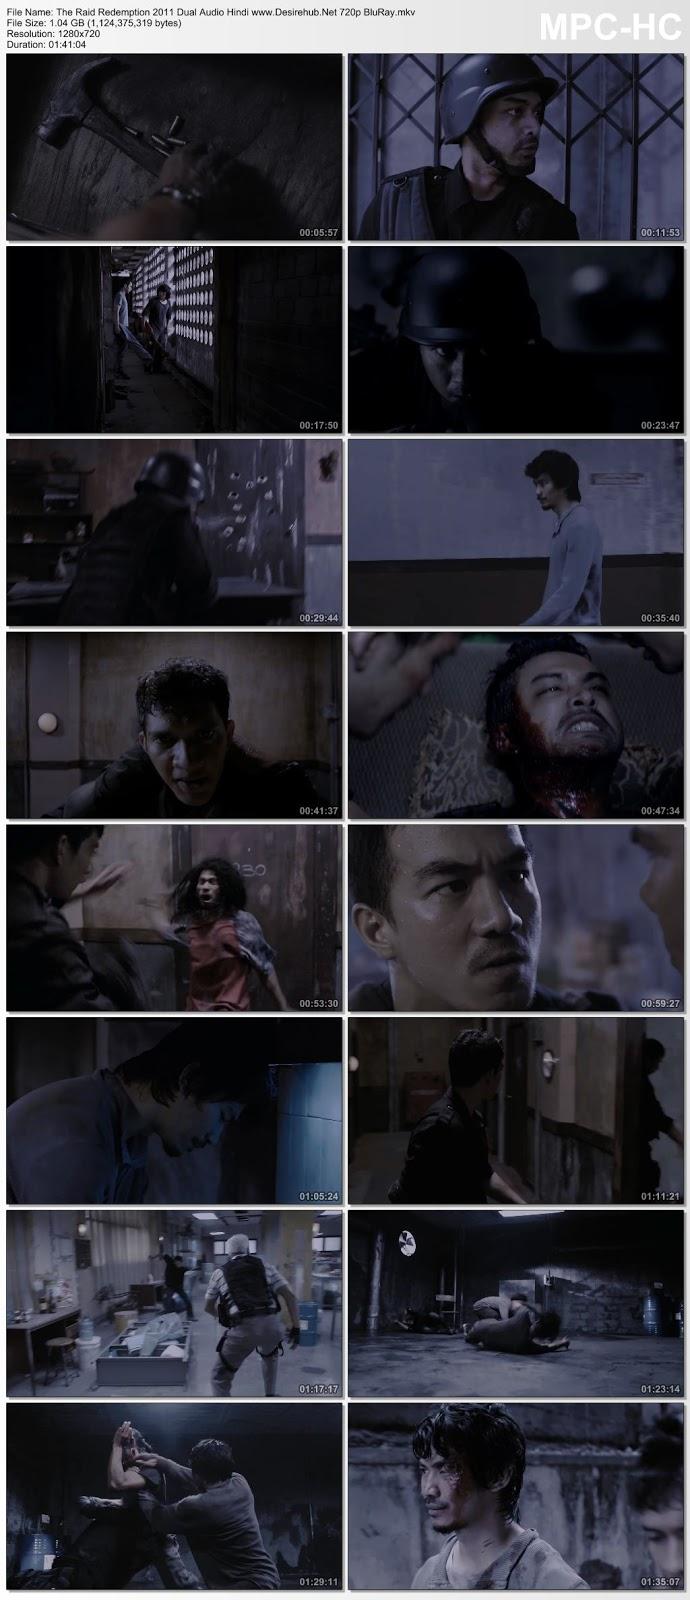 The Raid Redemption 2011 Dual Audio Hindi 720p BluRay 1GB Desirehub